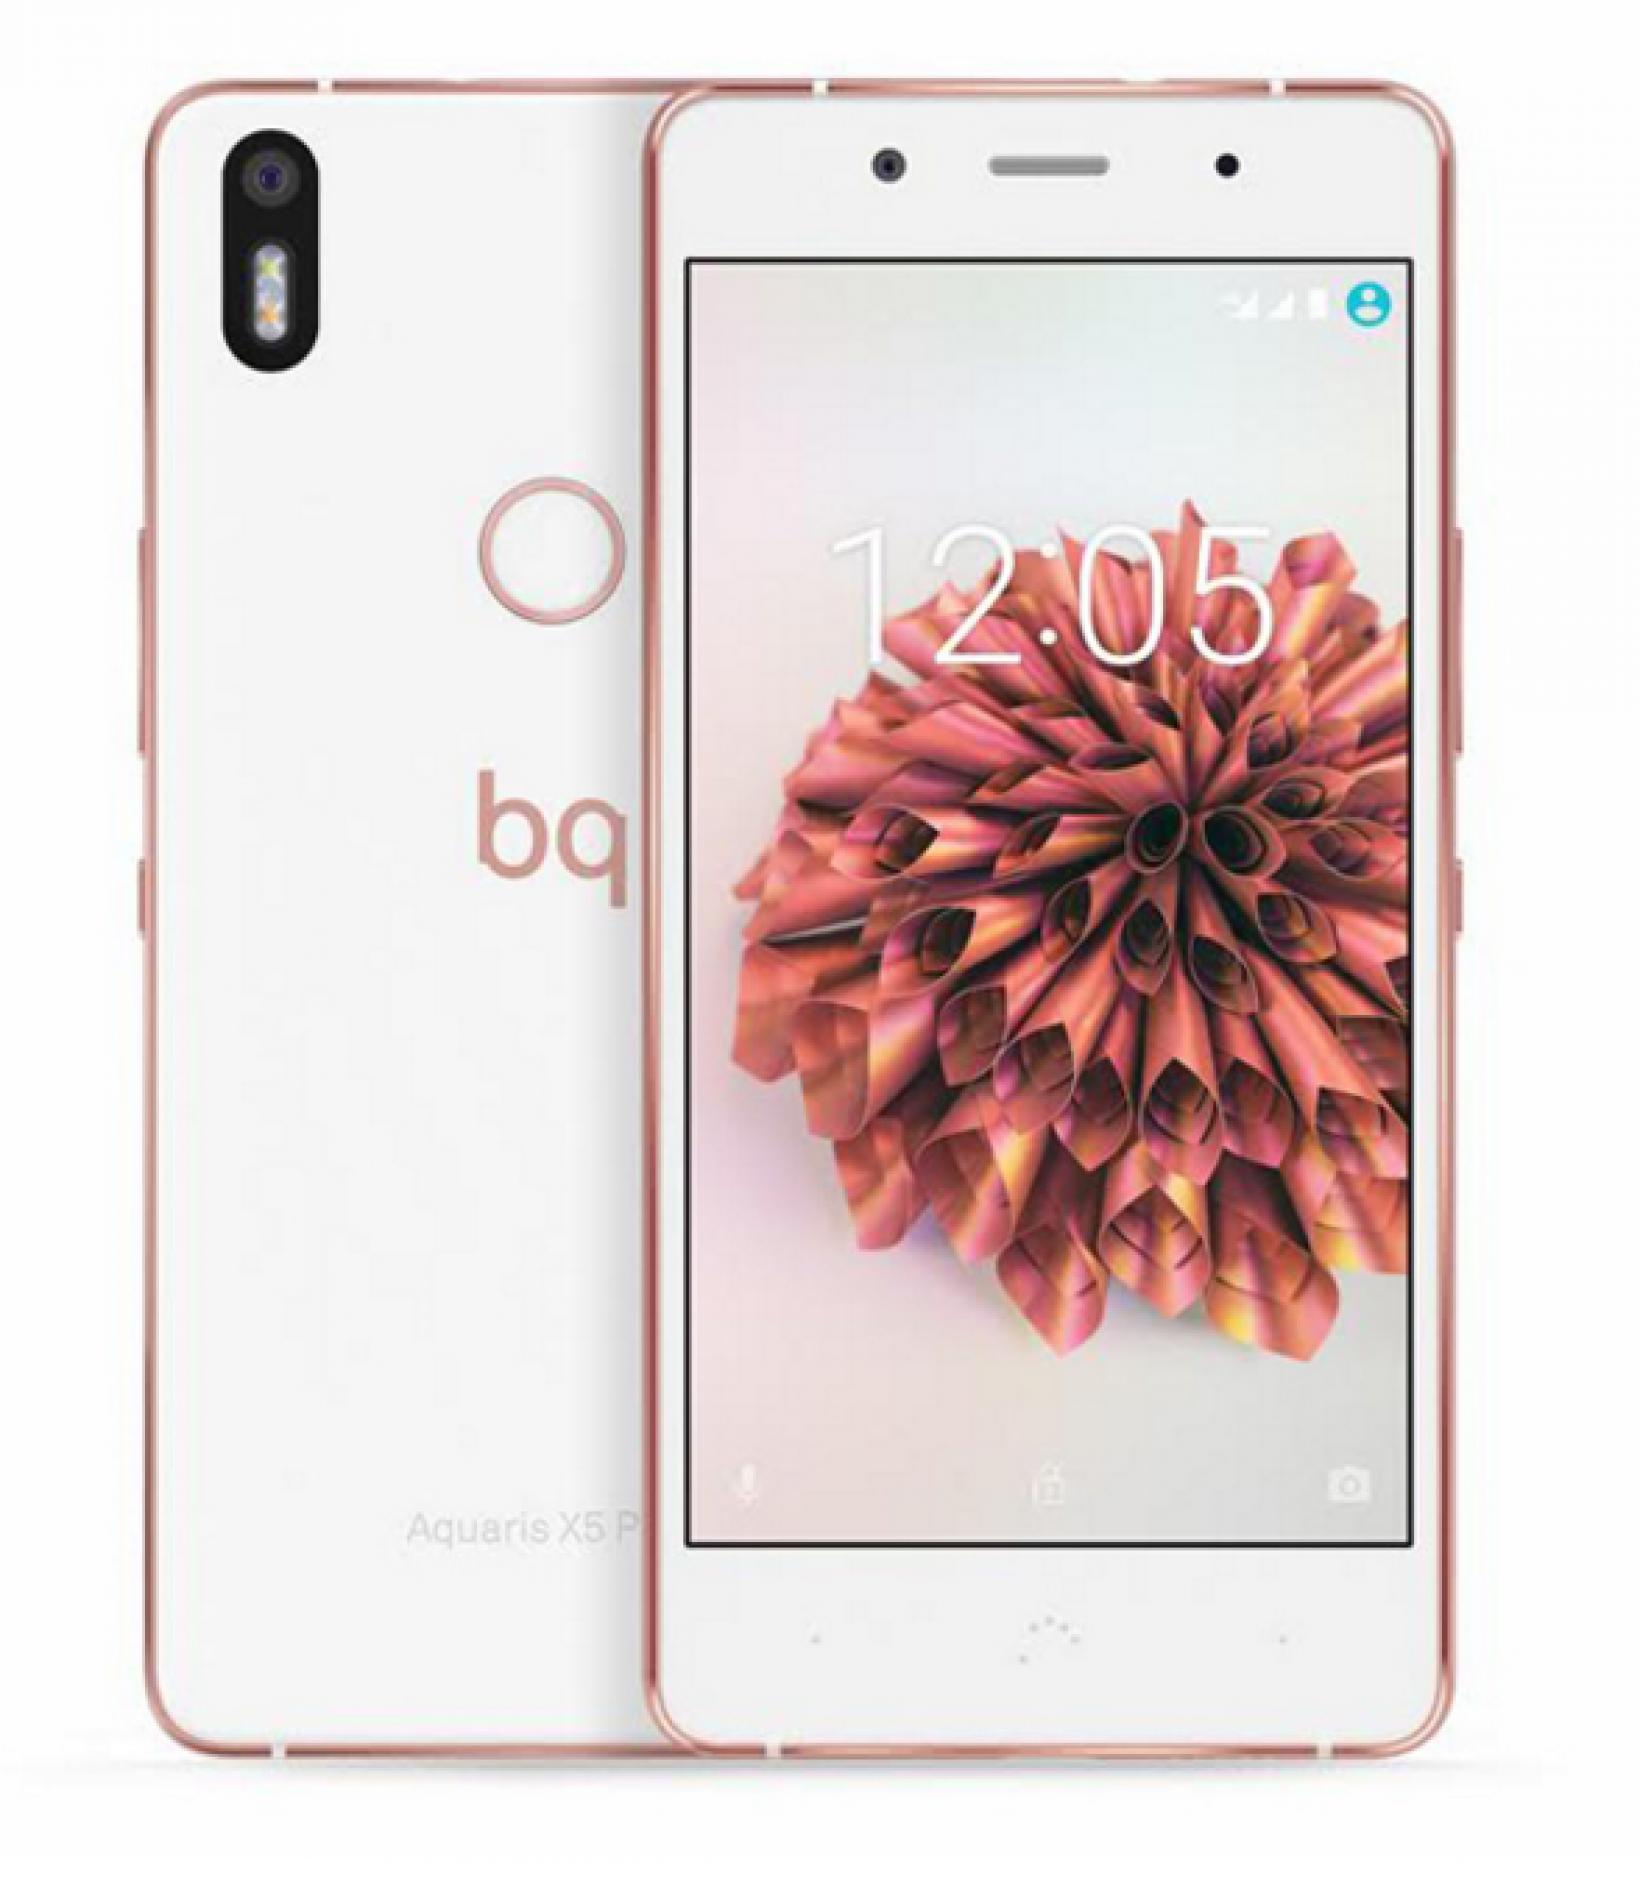 BQ Aquaris X5 Plus, the first European Galileo-ready smartphone to hit the market. ©BQ